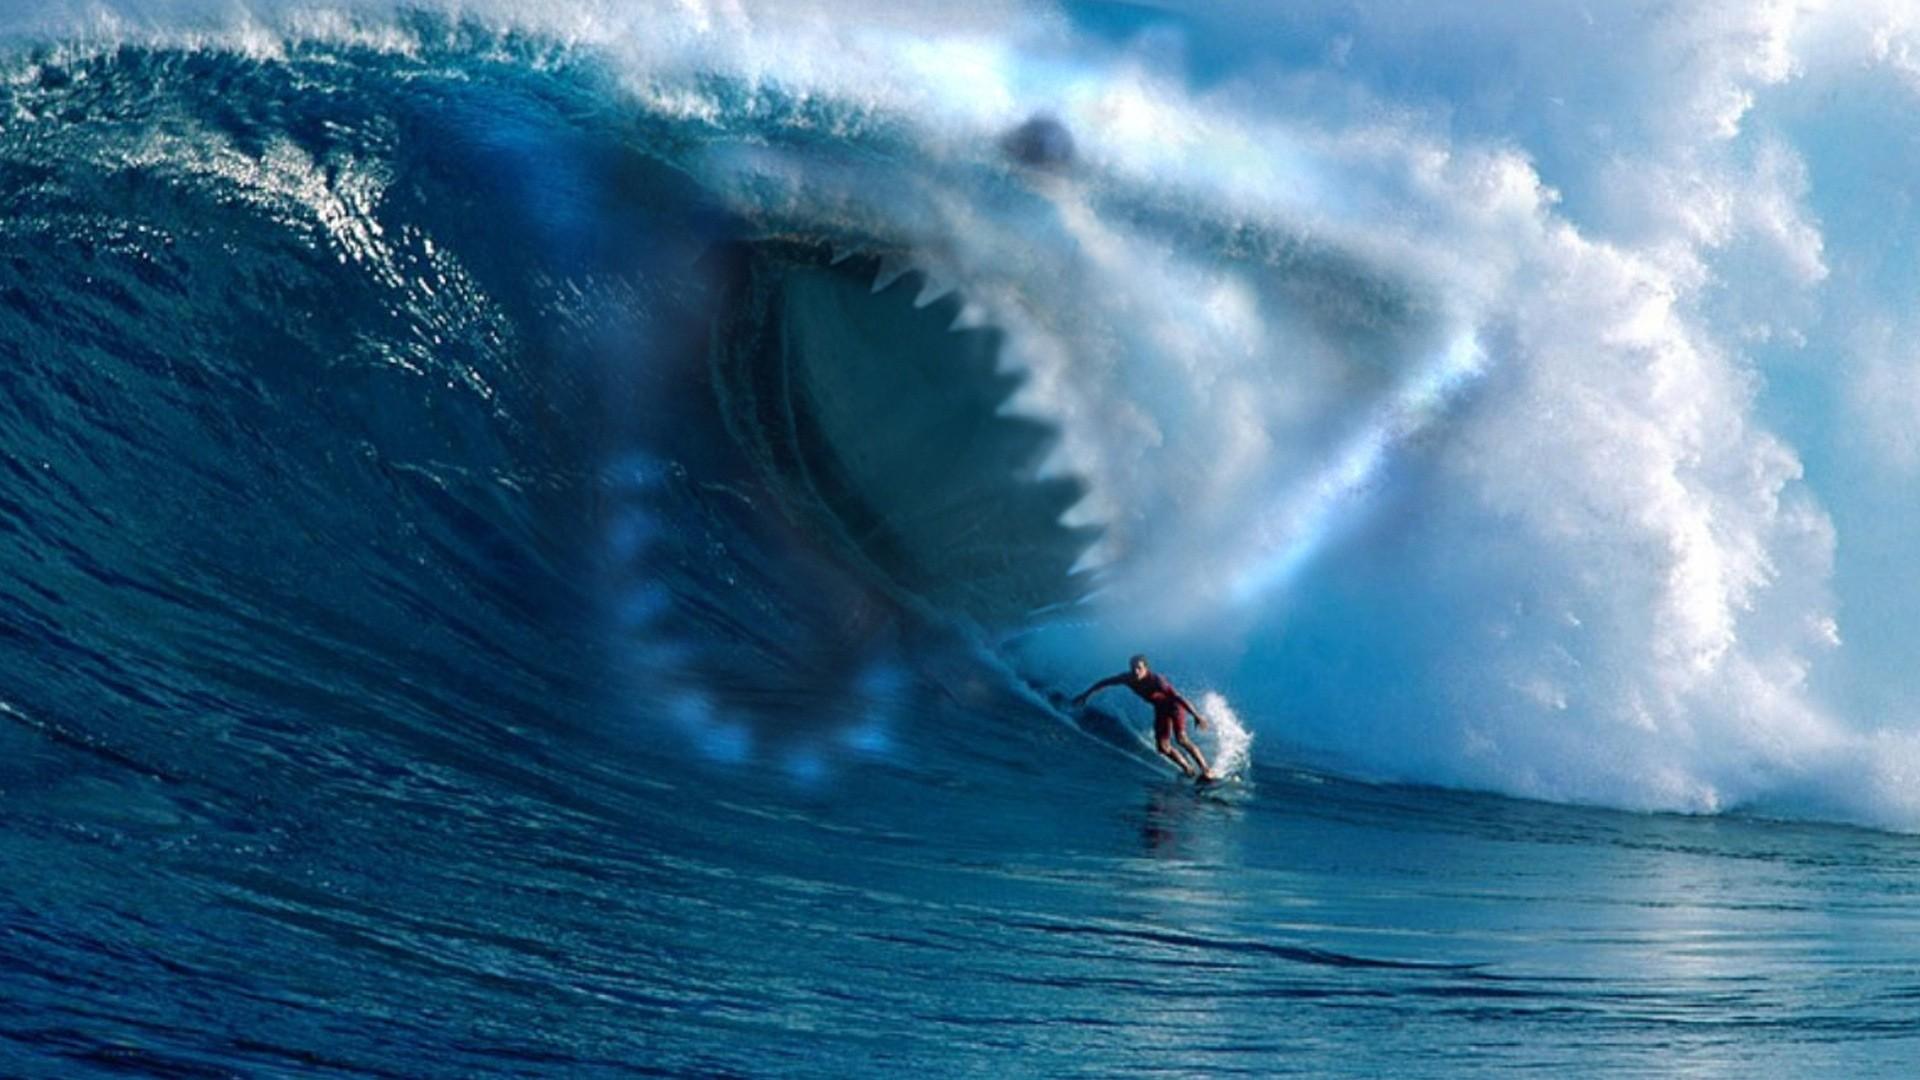 … wave · wave, shark, surfing